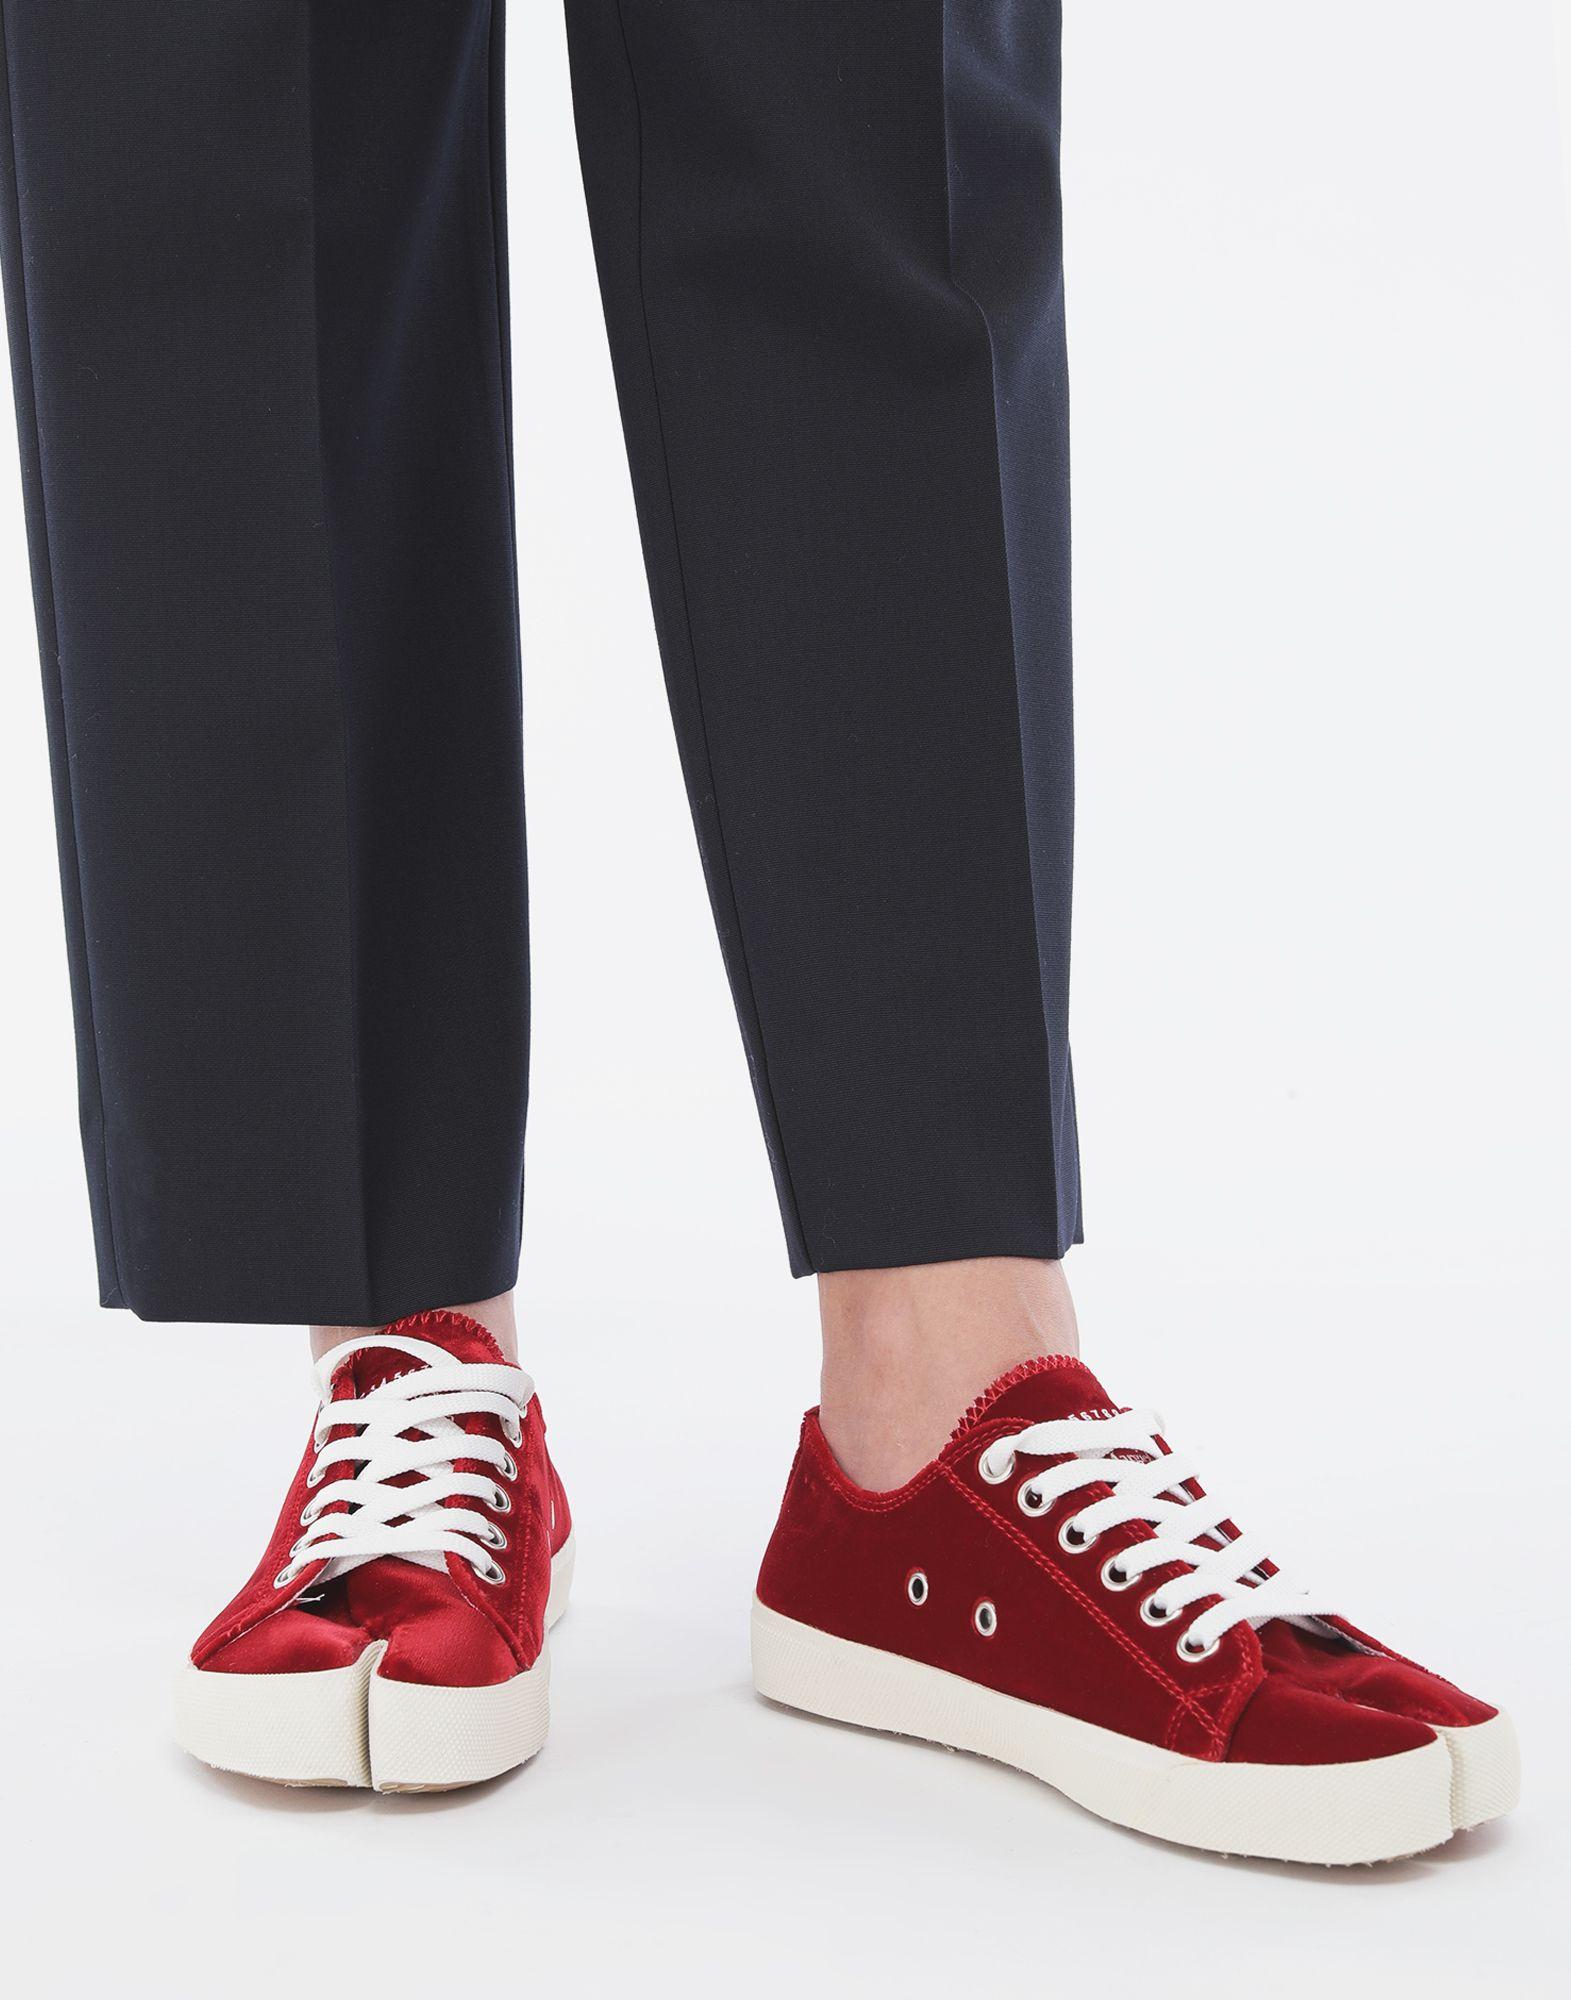 MAISON MARGIELA Tabi velvet sneakers Sneakers Tabi Woman r